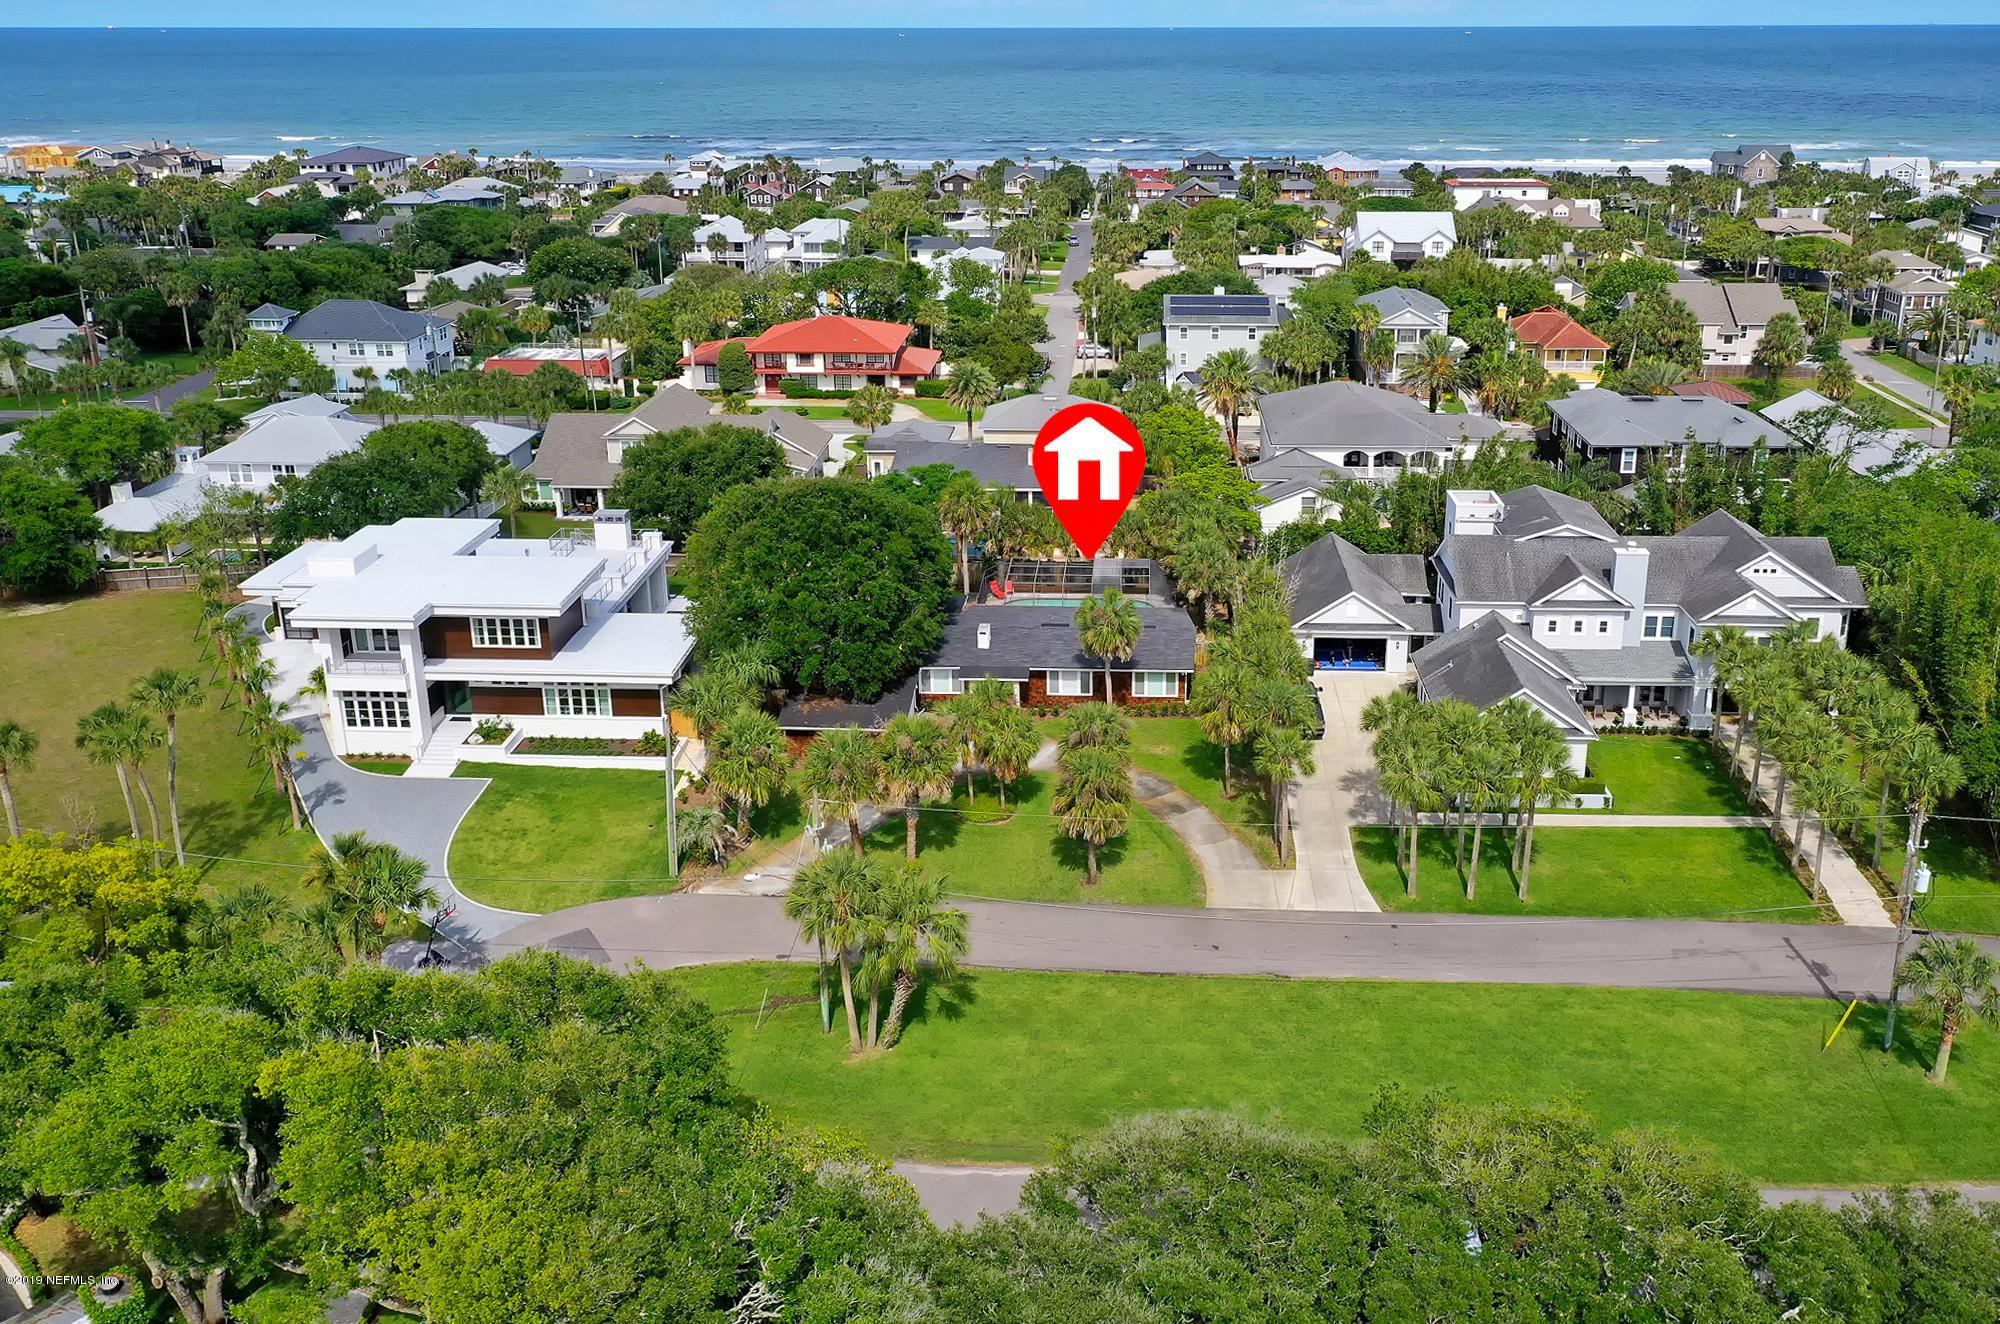 Photo of 1225 SELVA MARINA, ATLANTIC BEACH, FL 32233